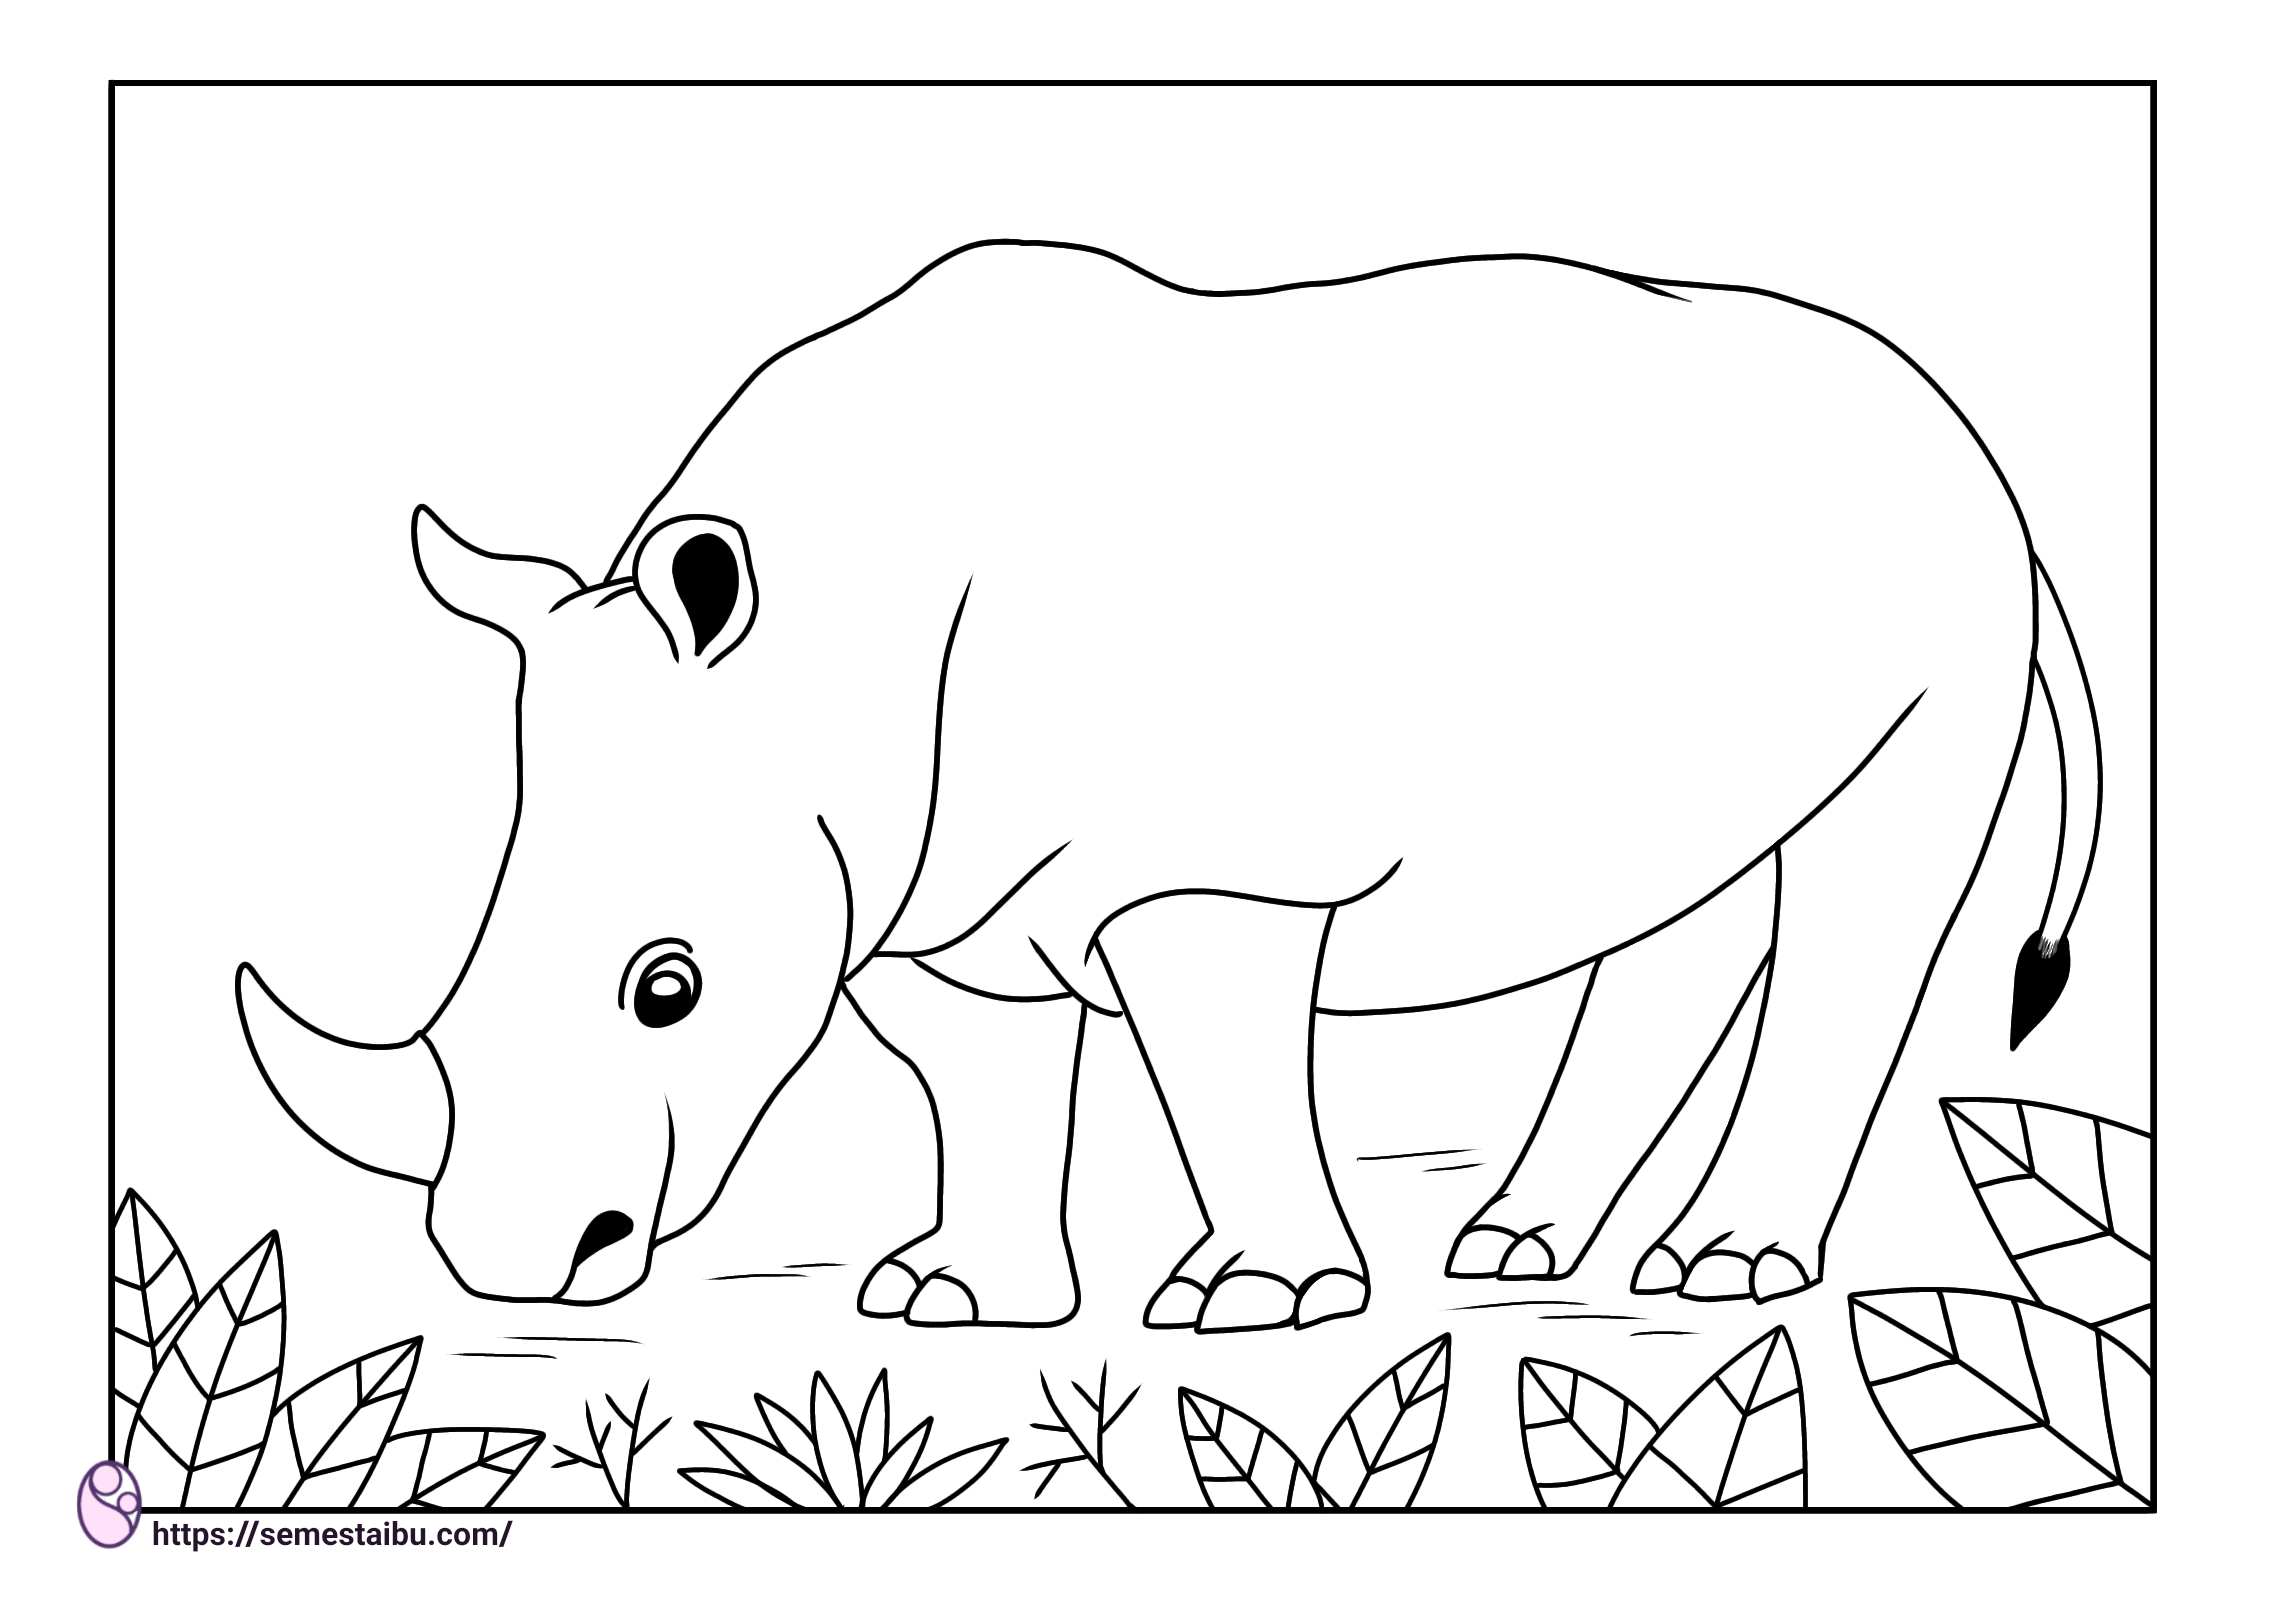 Gambar mewarnai hewan untuk anak tk - badak